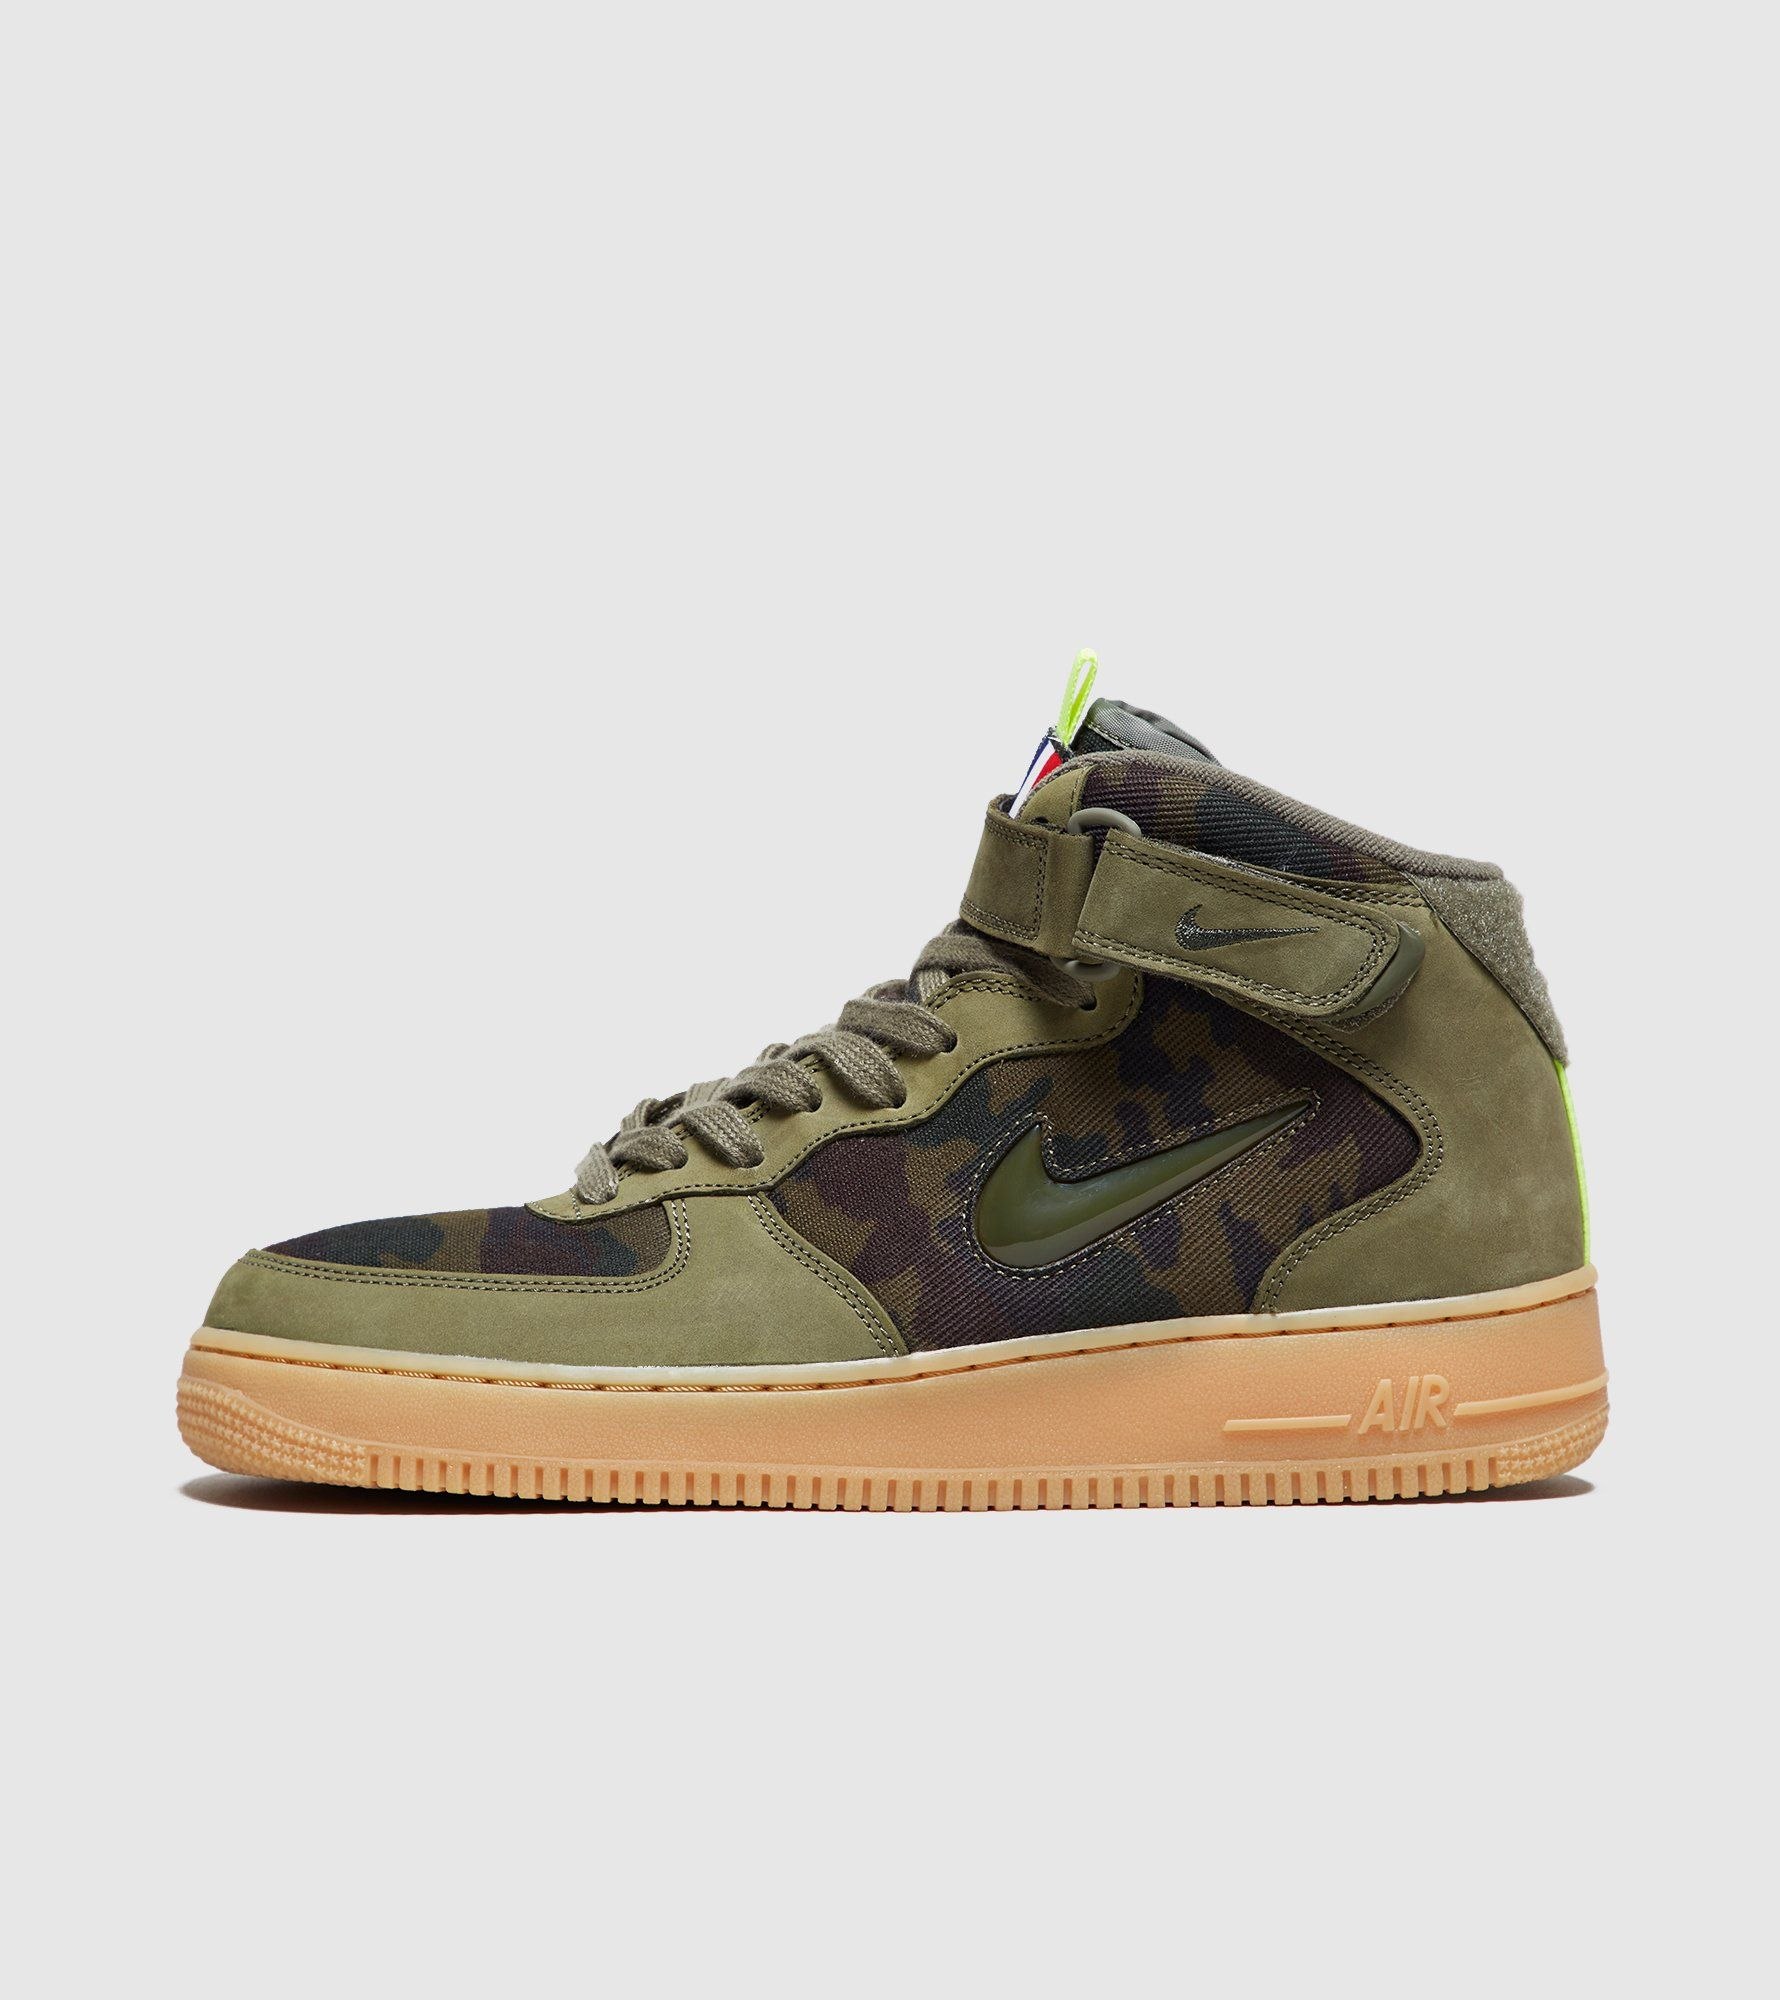 240717cc07 Nike Air Force 1 Jewel Mid | Size?